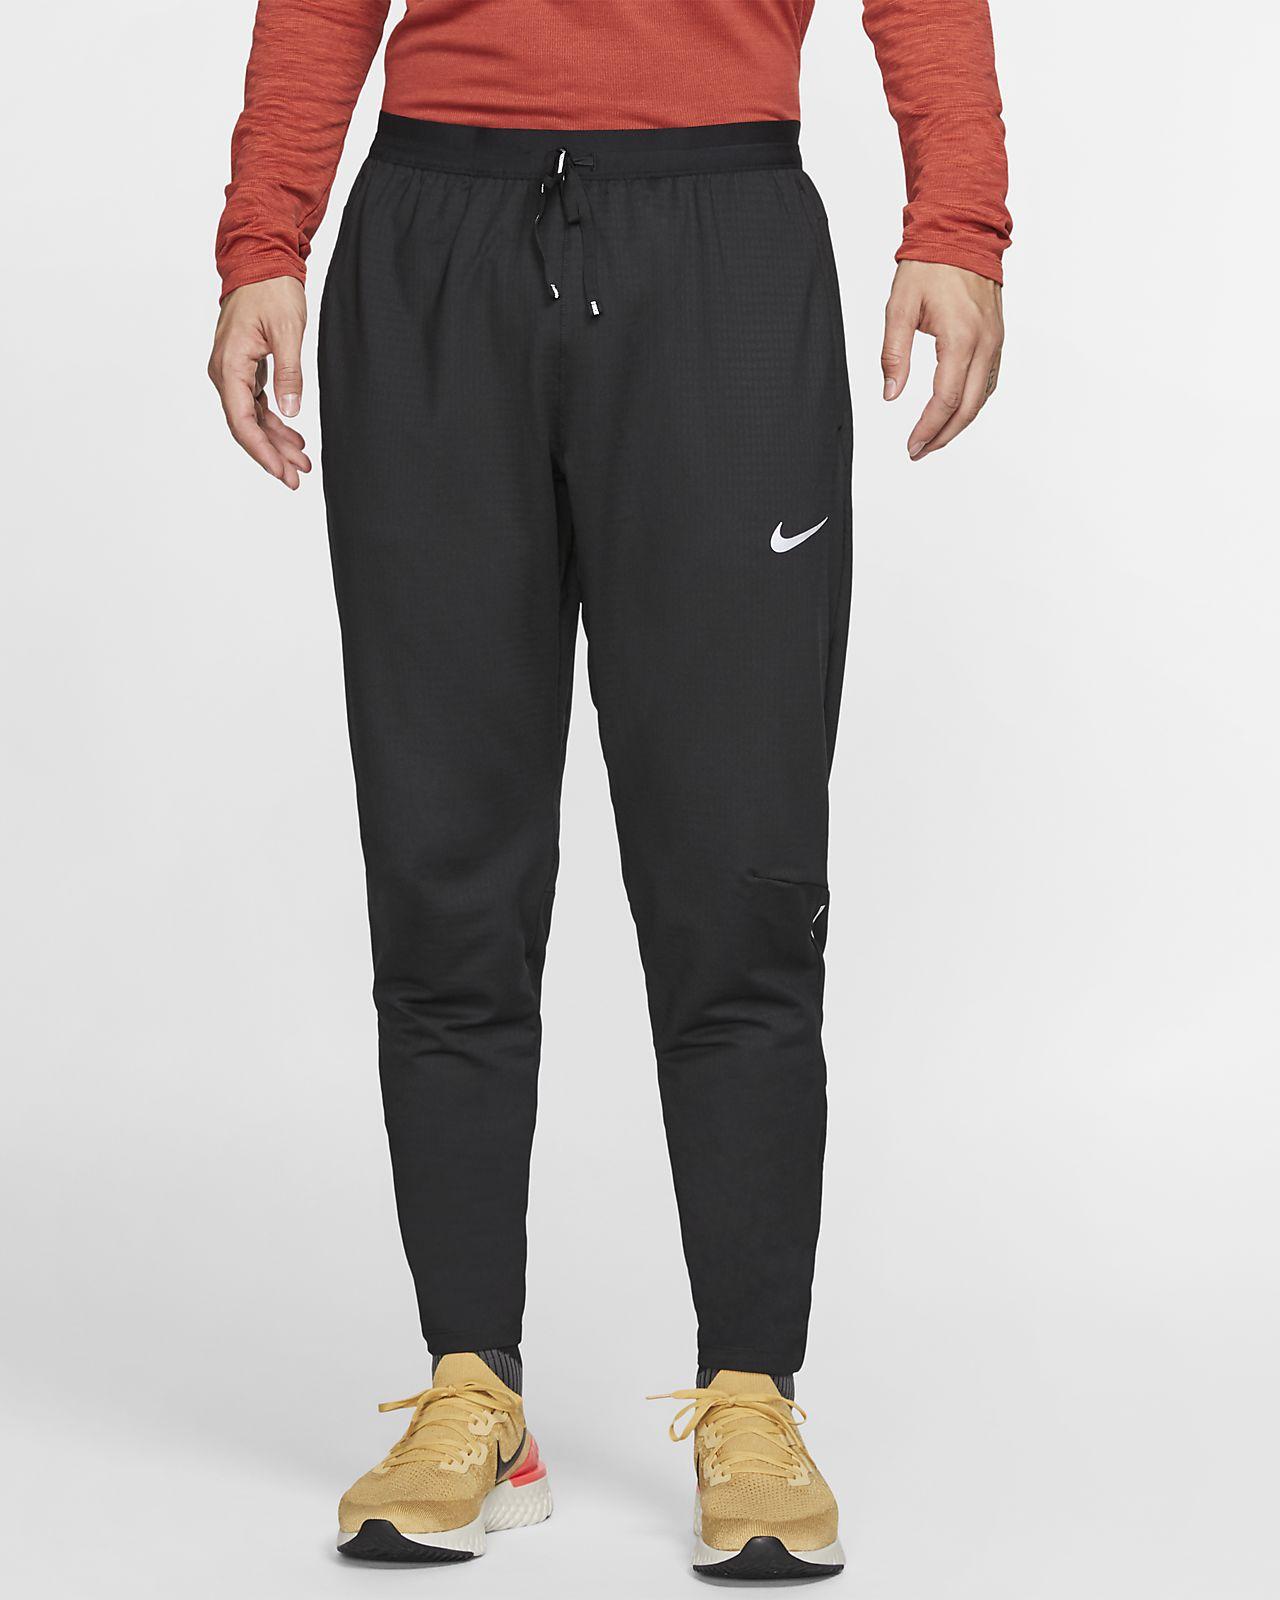 Pantalon de running en maille Nike Phenom pour Homme